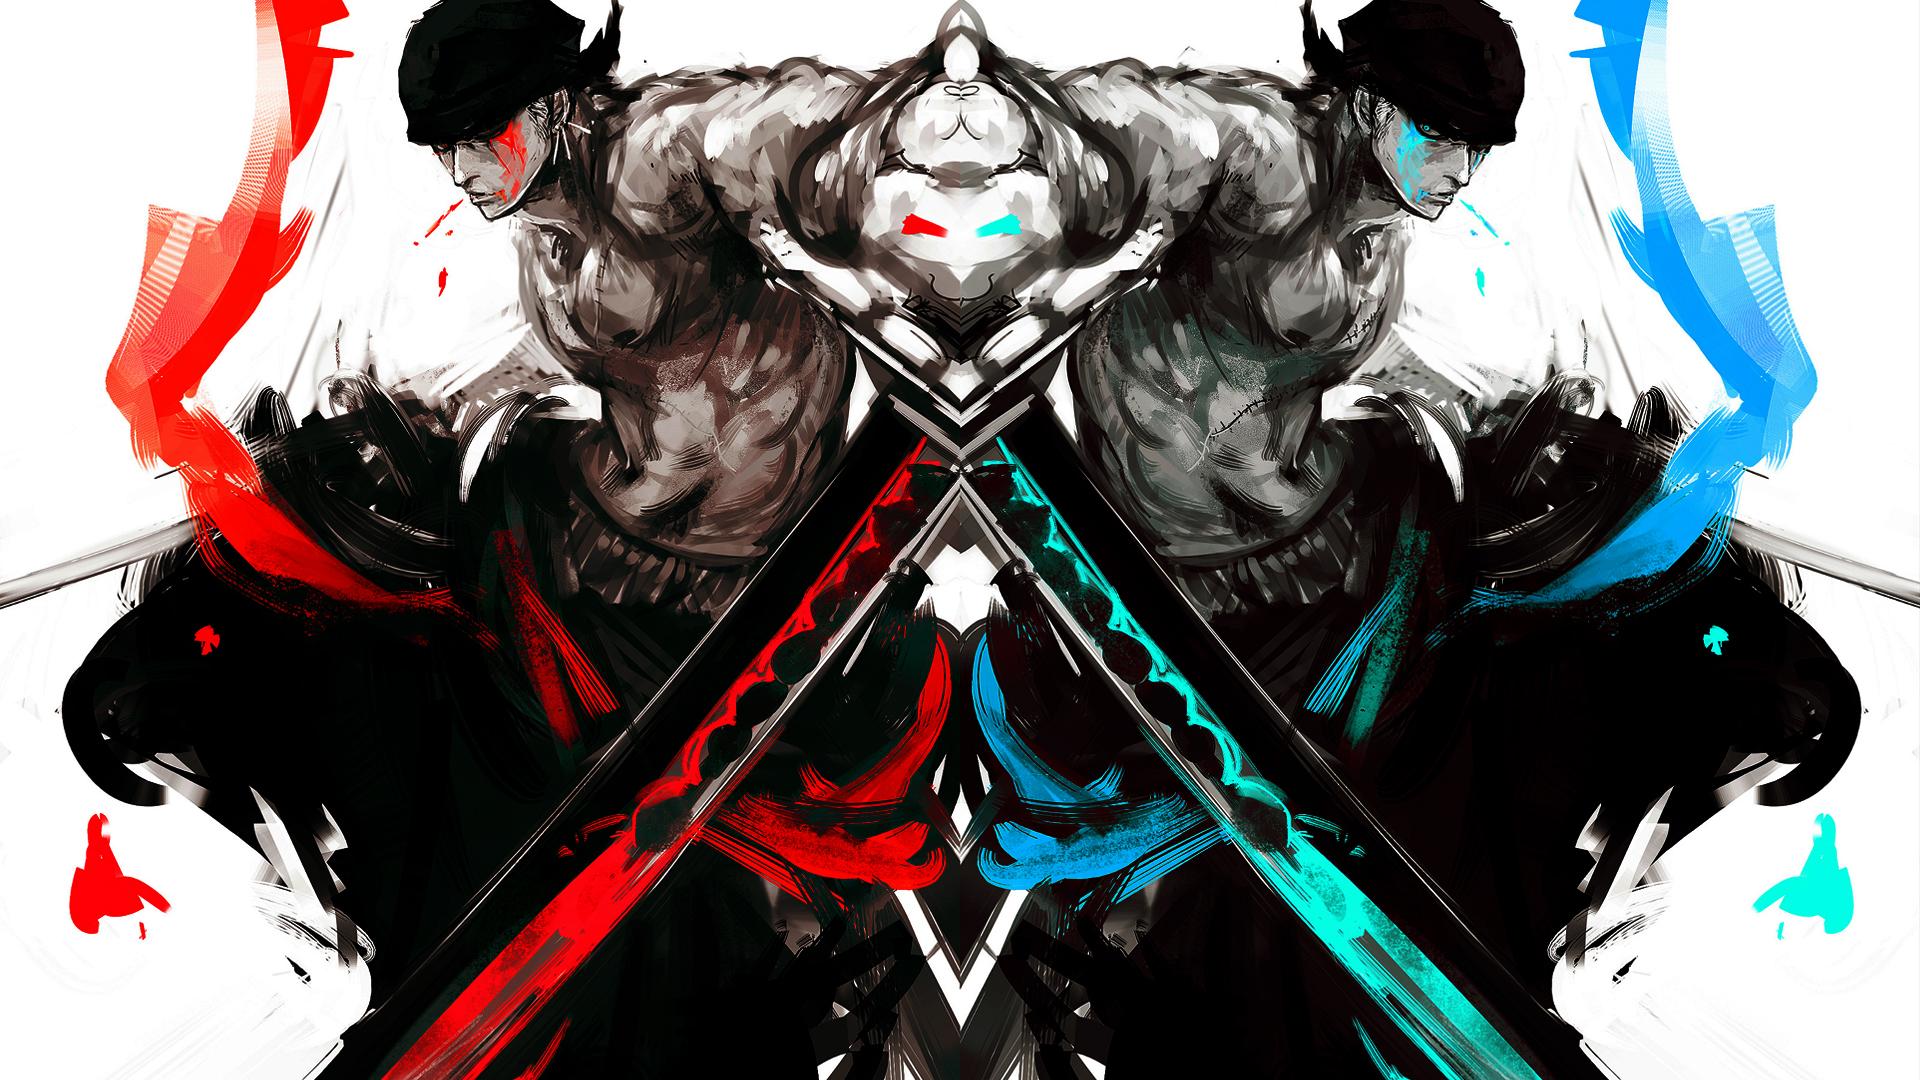 roronoa zoro one piece anime hd 1920x1080 1920x1080